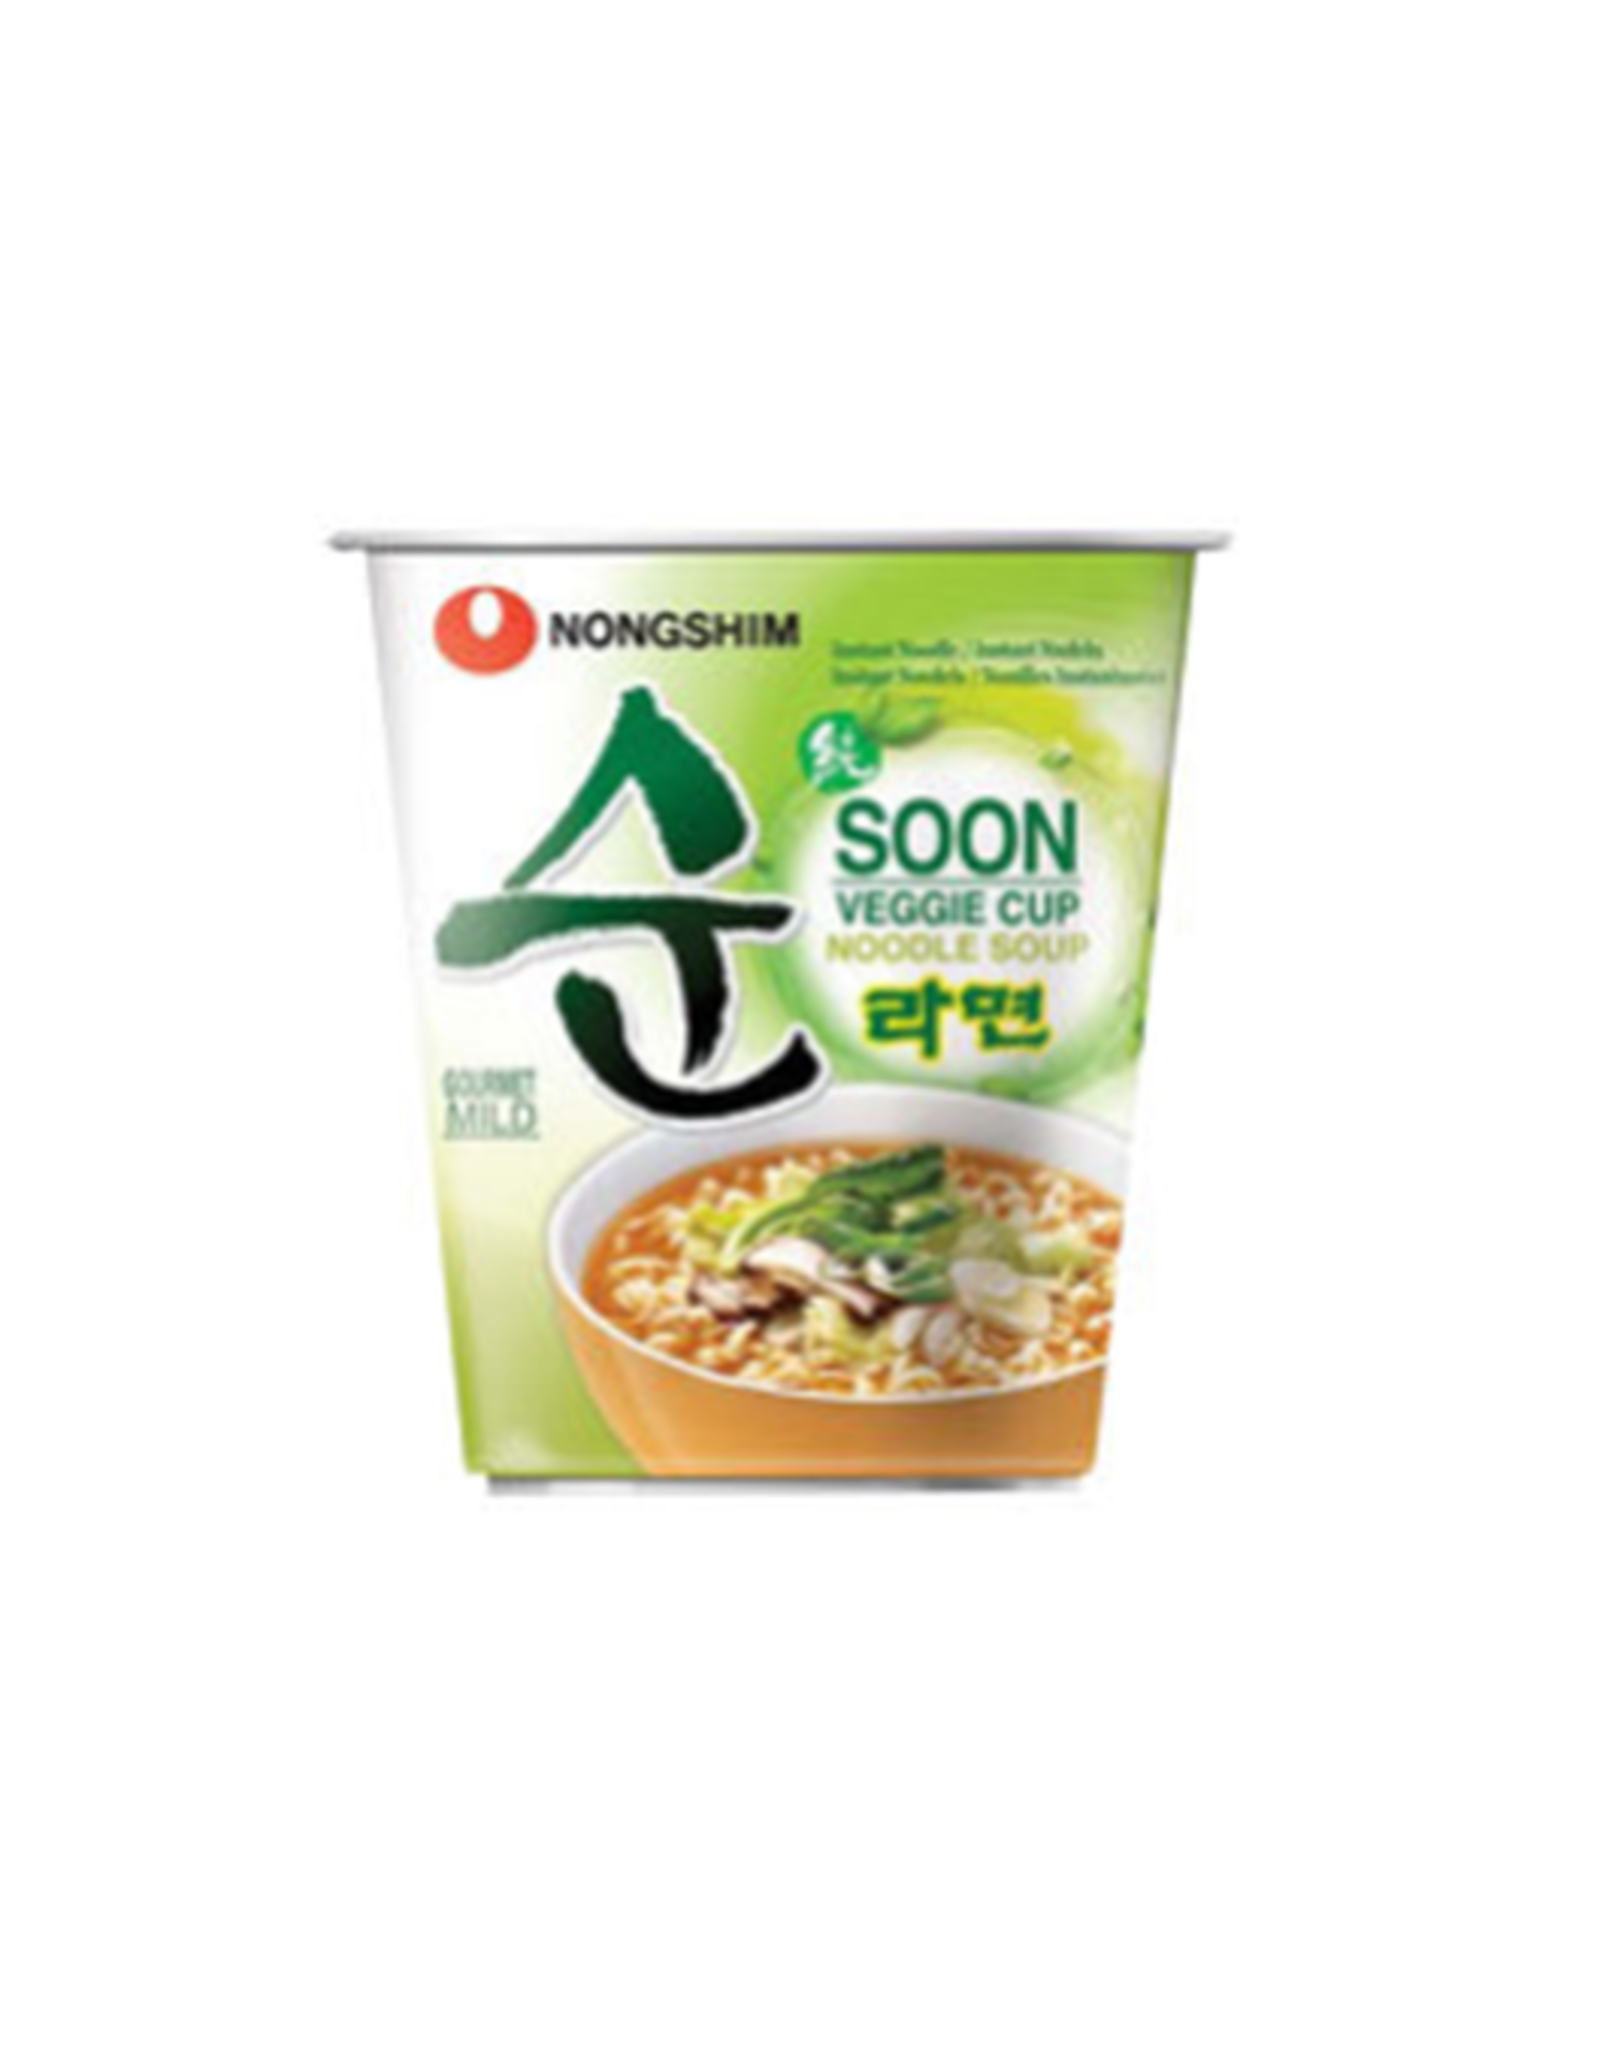 Nongshim Ramyung Soon Veggie Cup